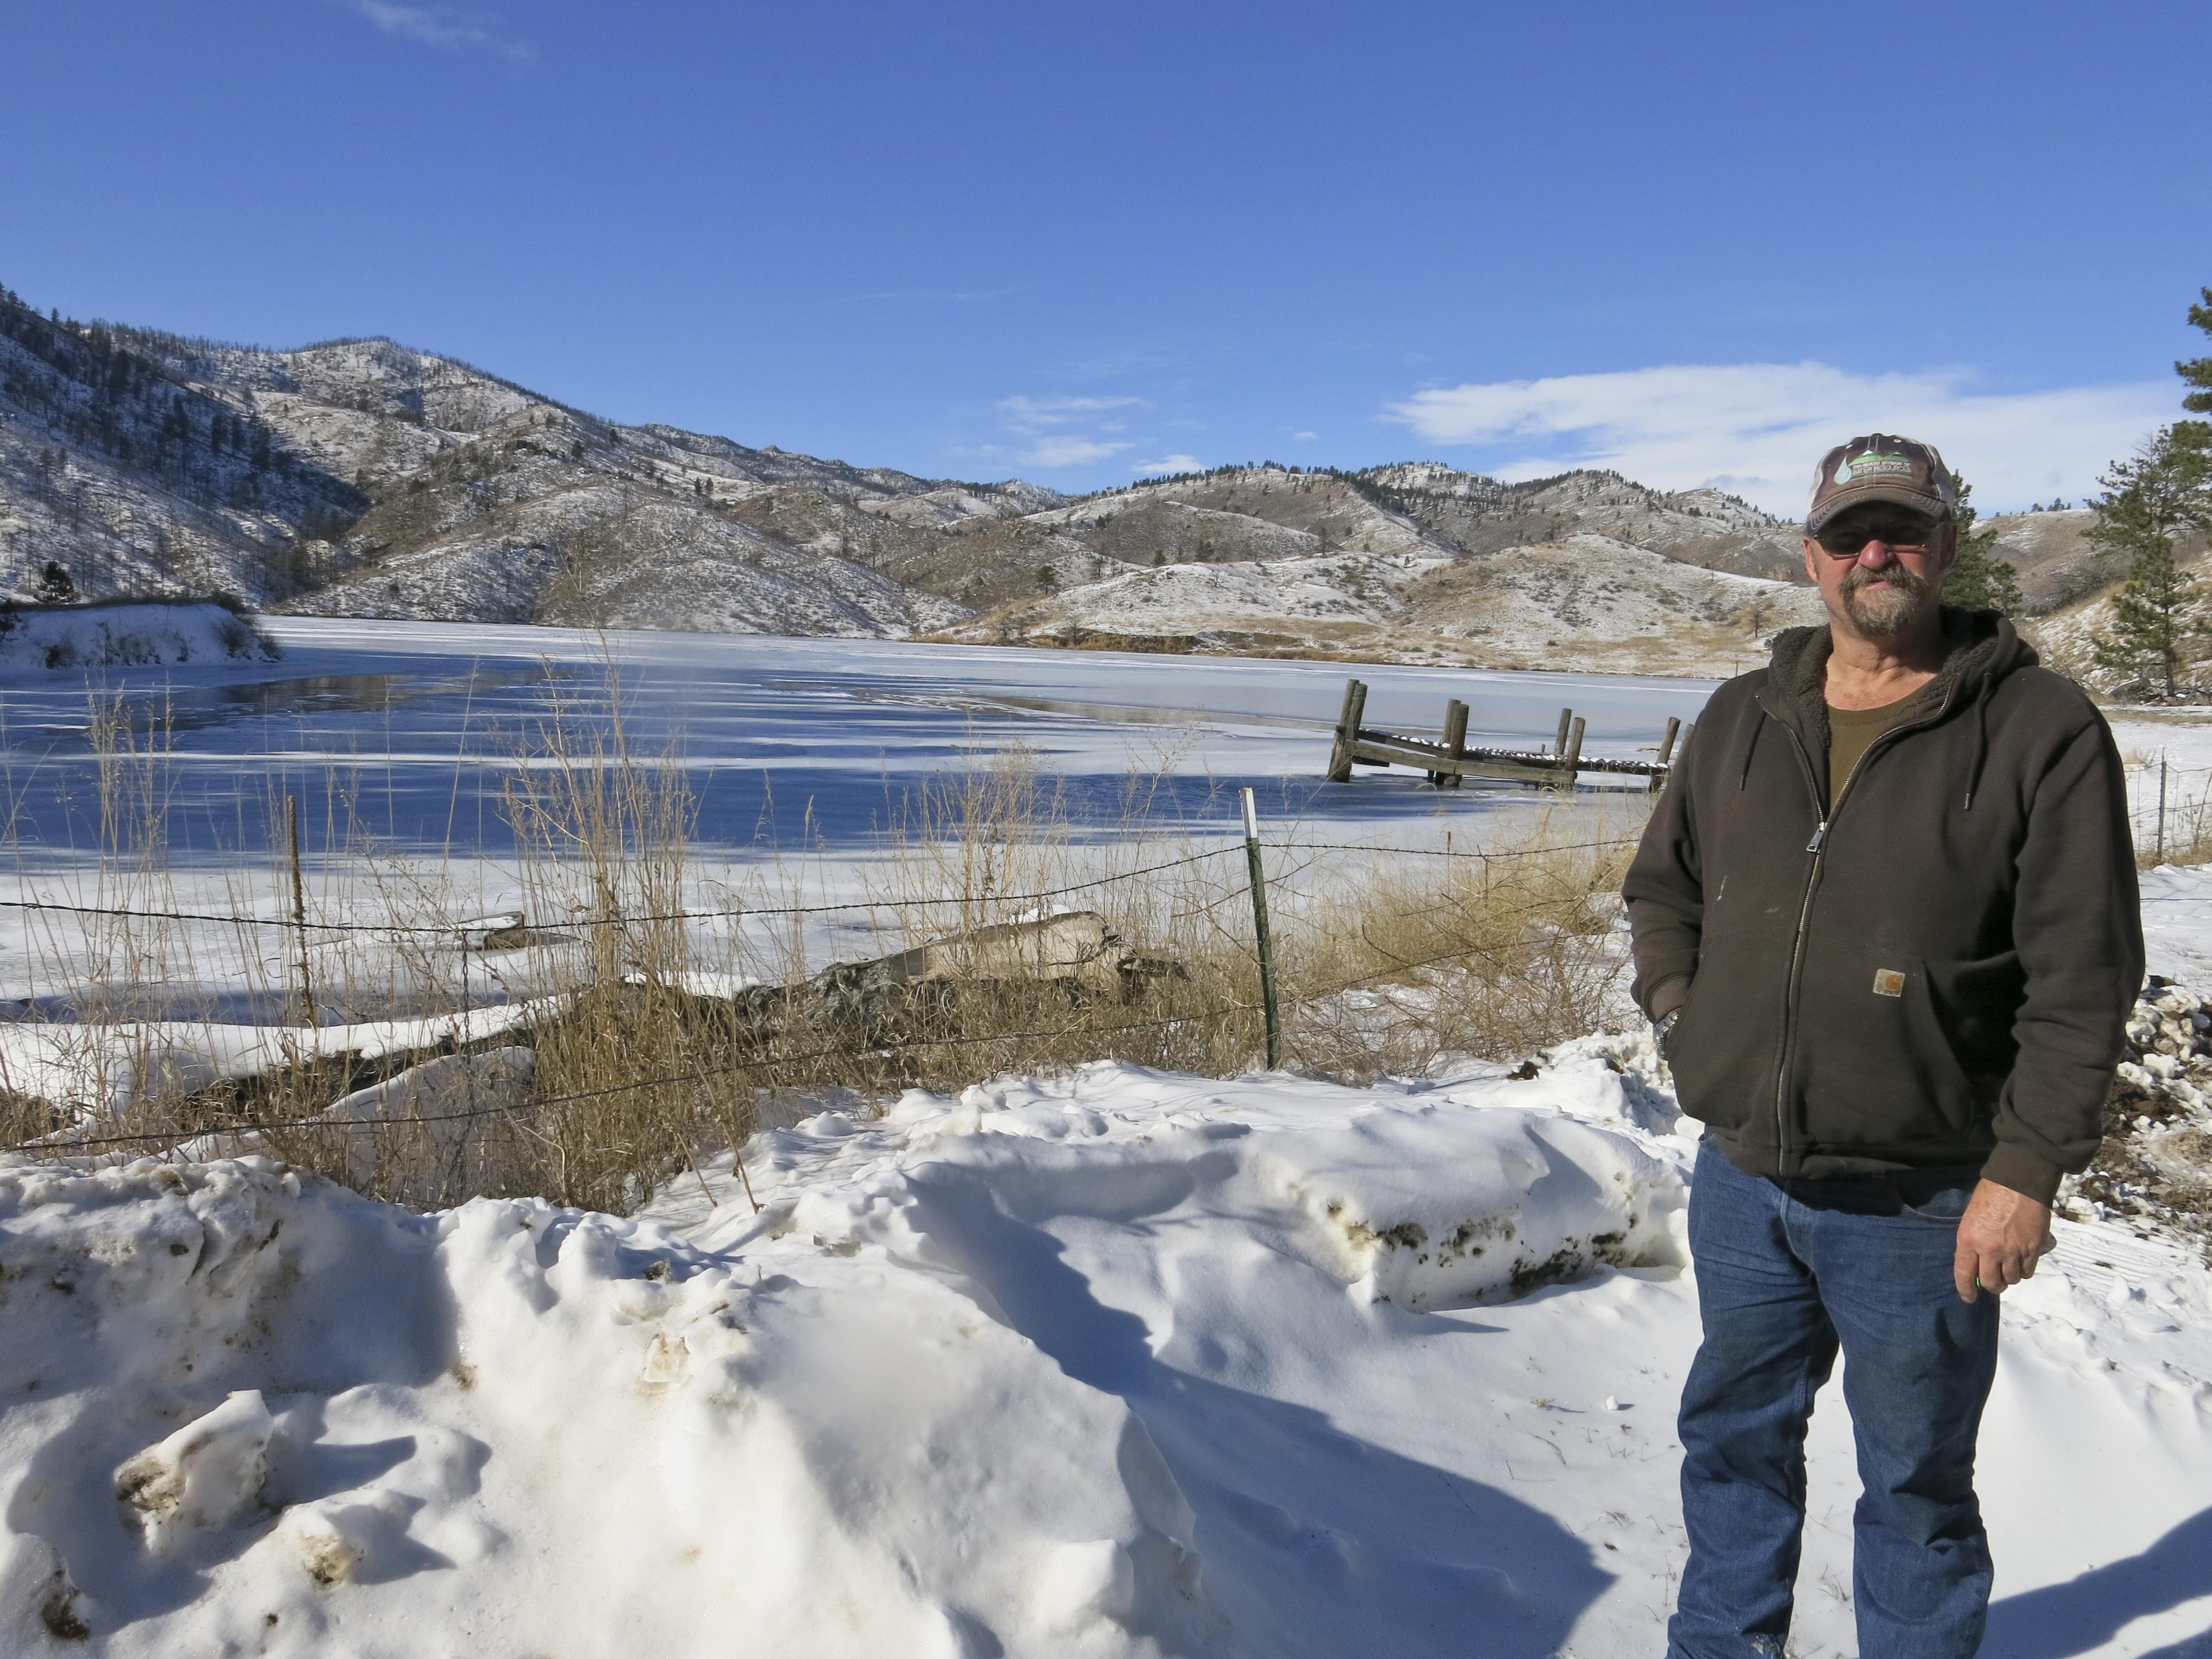 Photo: Reservoir caretaker 1 | Doug Billingsley at Milton Seaman Reservoir (Staff)